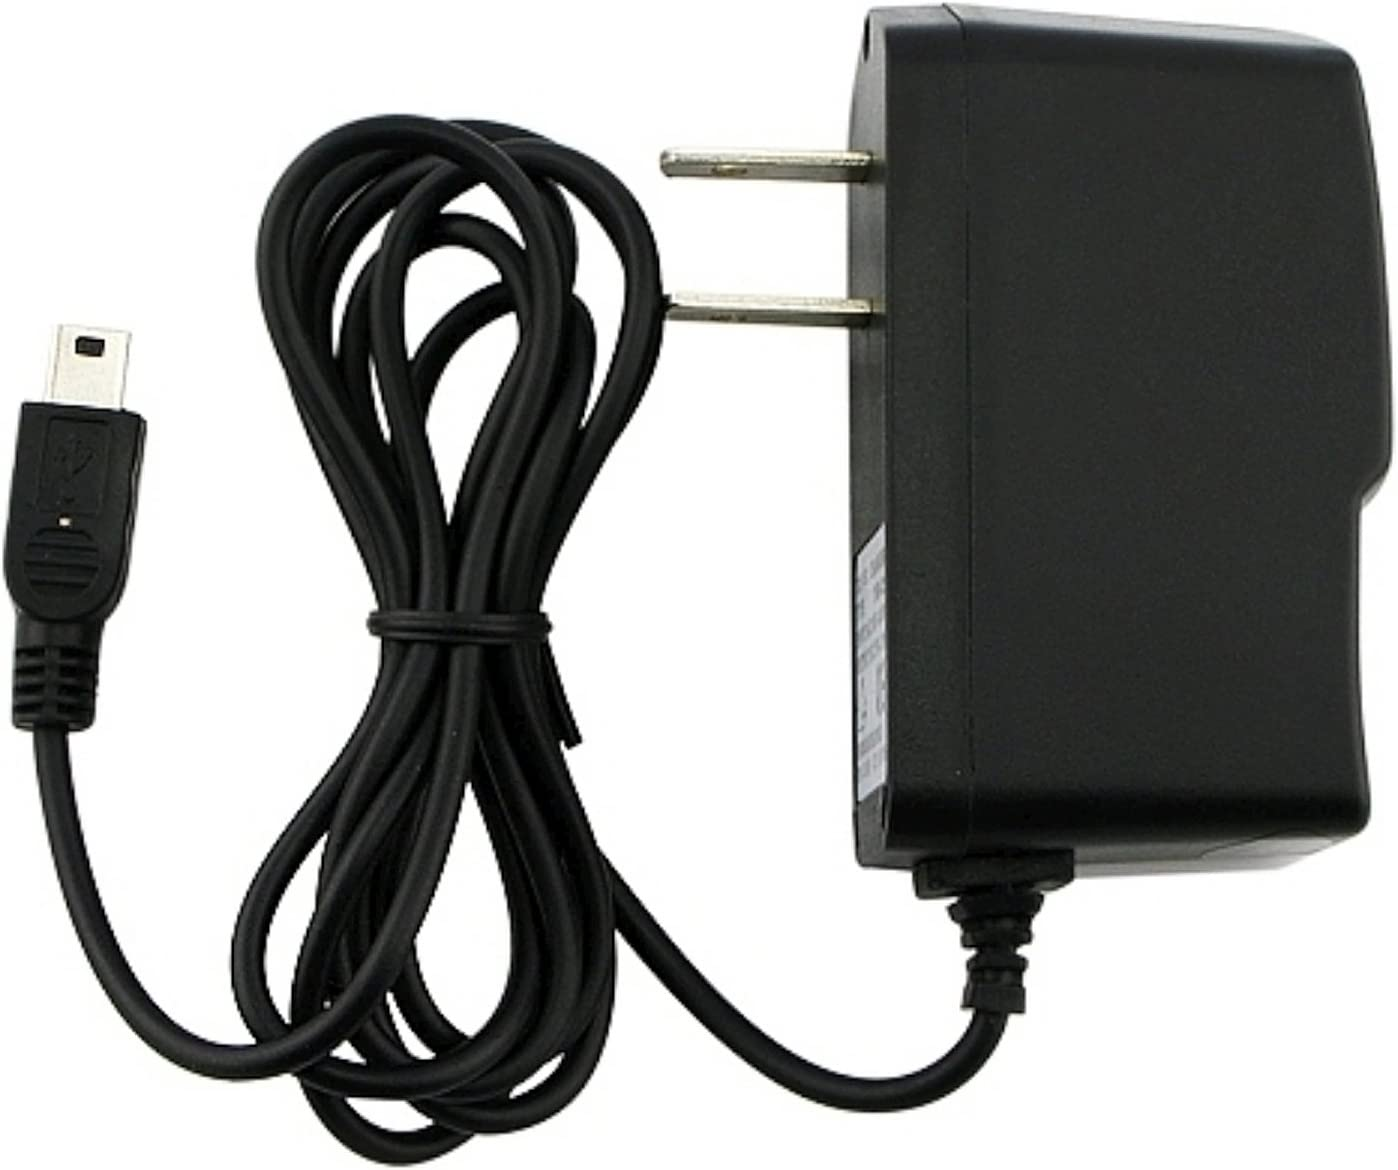 TOMTOM VIA 4EN62 4EV52 4EV42 1605 1635 180 200 220 GPS Car Charger Cable Cord